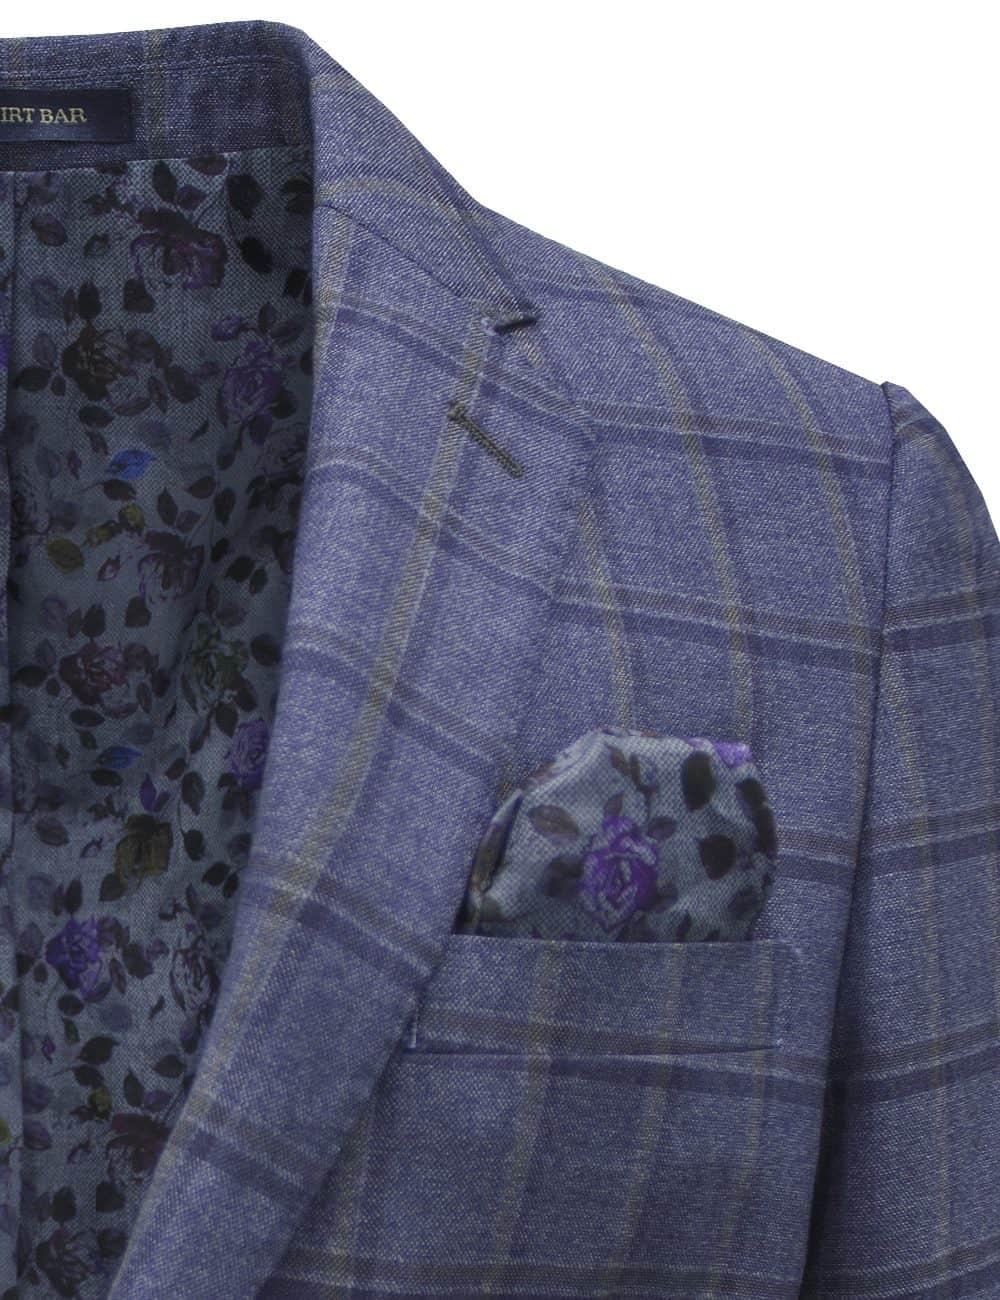 Slim Fit Dark Blue Checks Single Breasted Blazer - S2B4.4